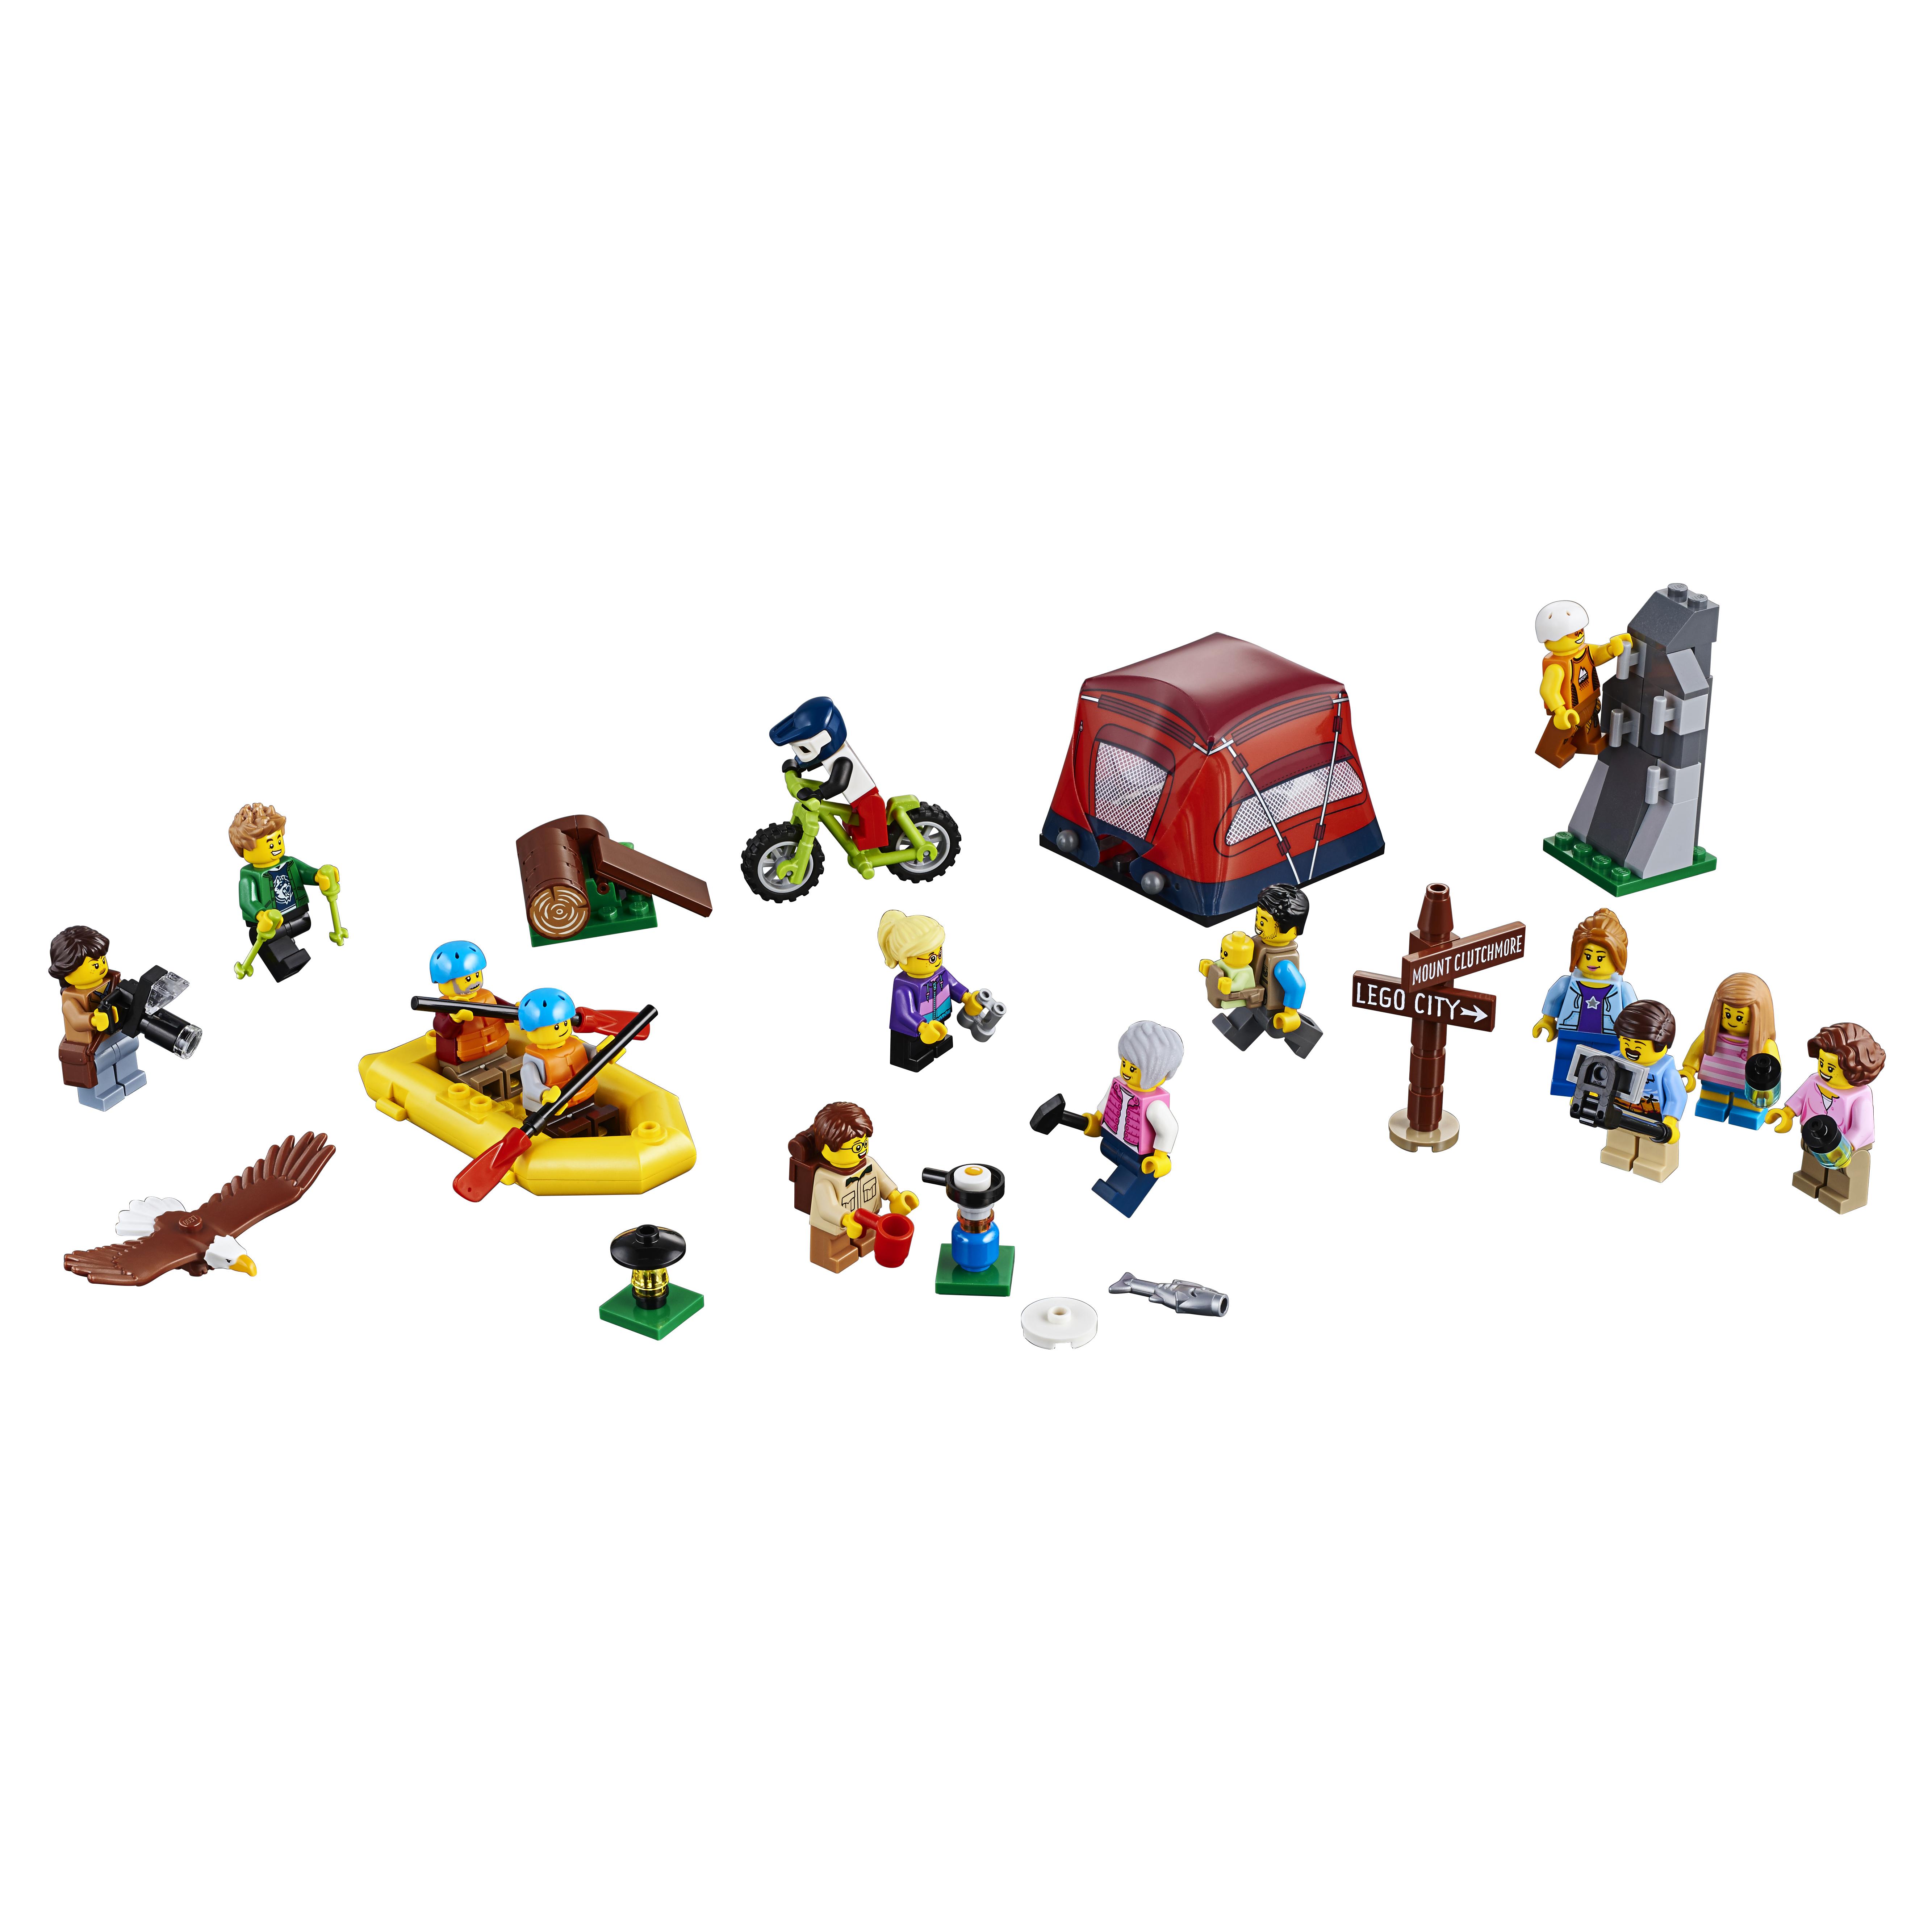 Конструктор LEGO City Town Любители активного отдыха 60202 LEGO фото